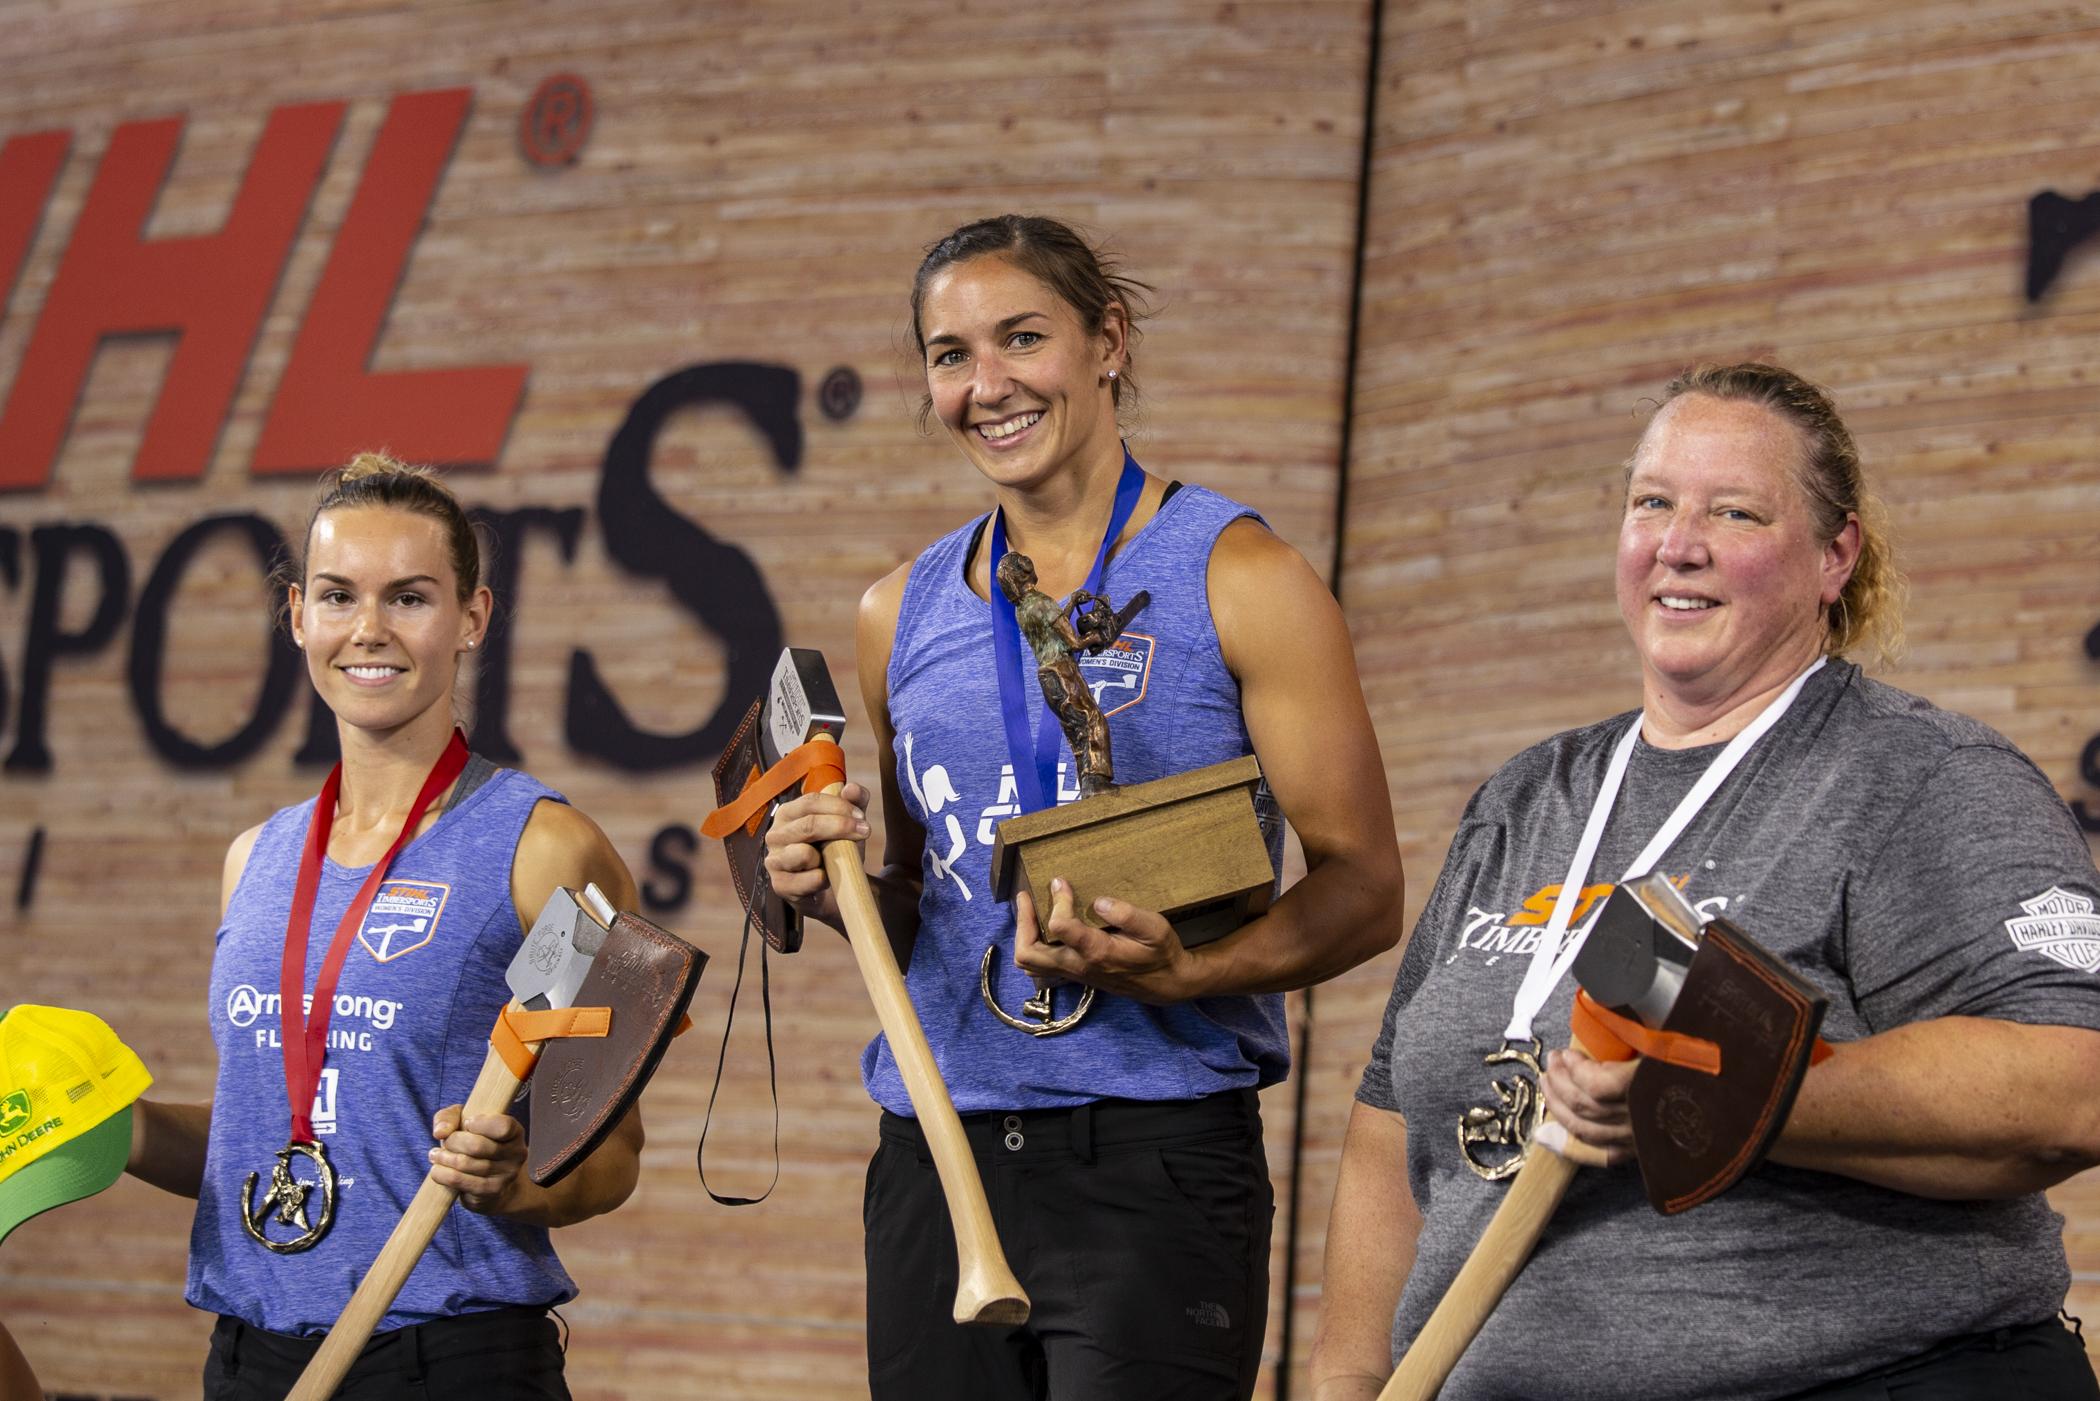 Erin LaVoie won the Women's Division Championship